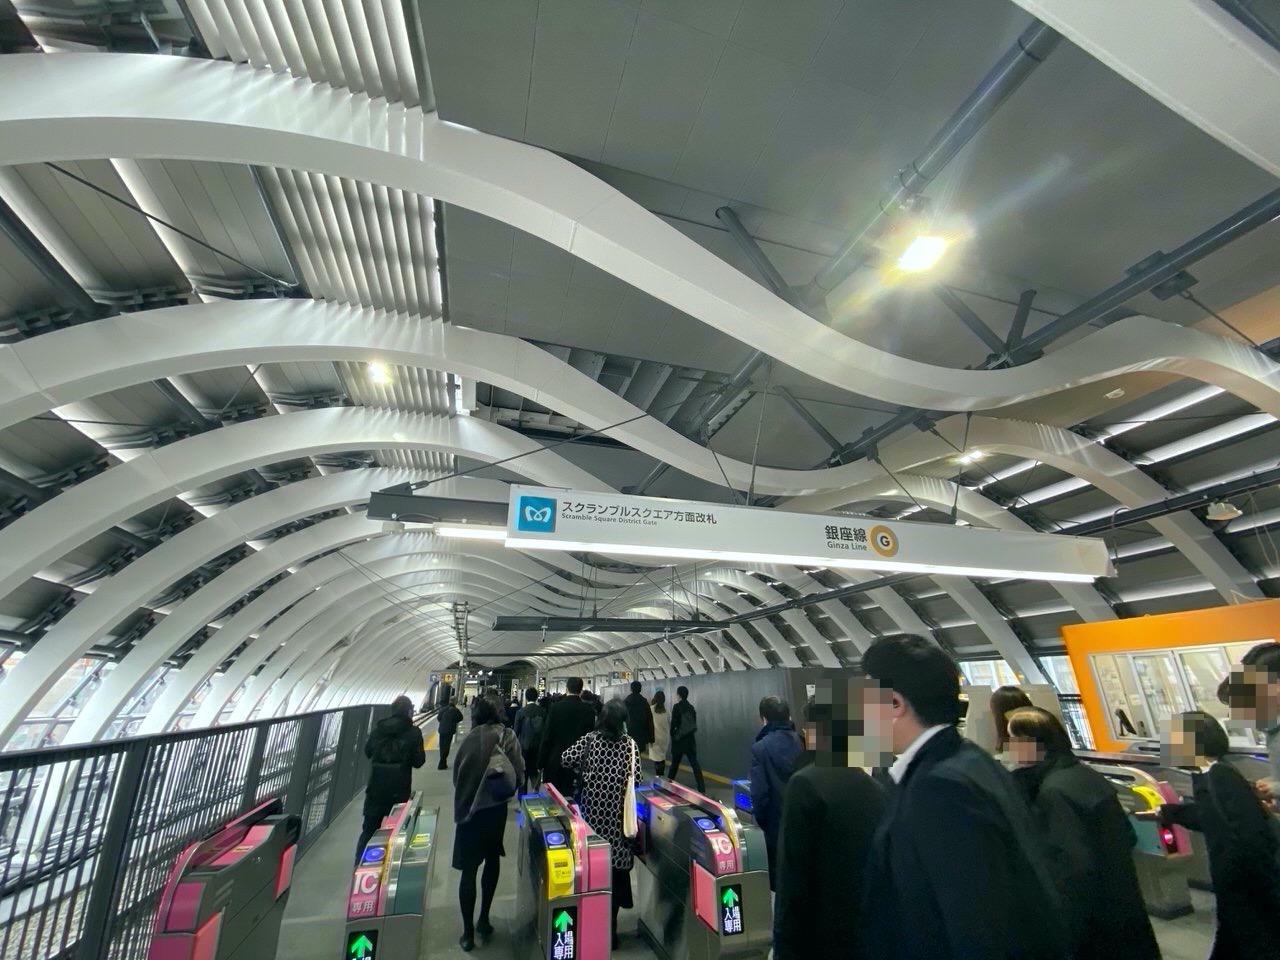 JR渋谷駅に新設された中央東改札を利用してみた 5